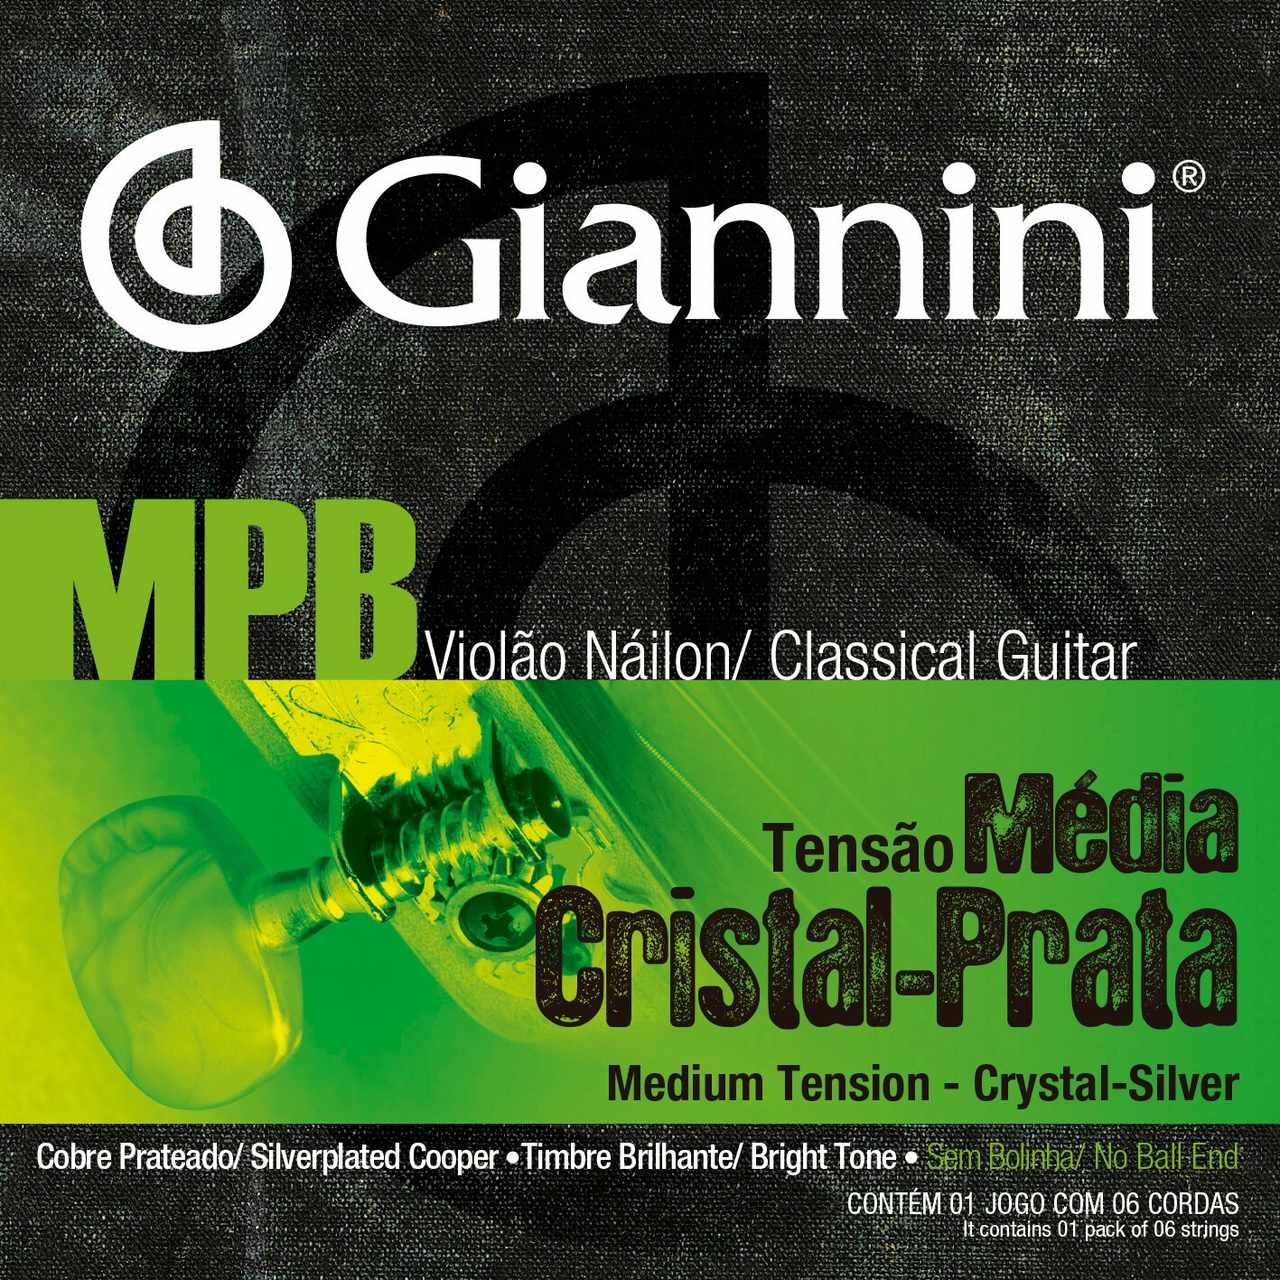 Encordoamento p/Violão Nylon Giannini Cristal/Prata - GENWS